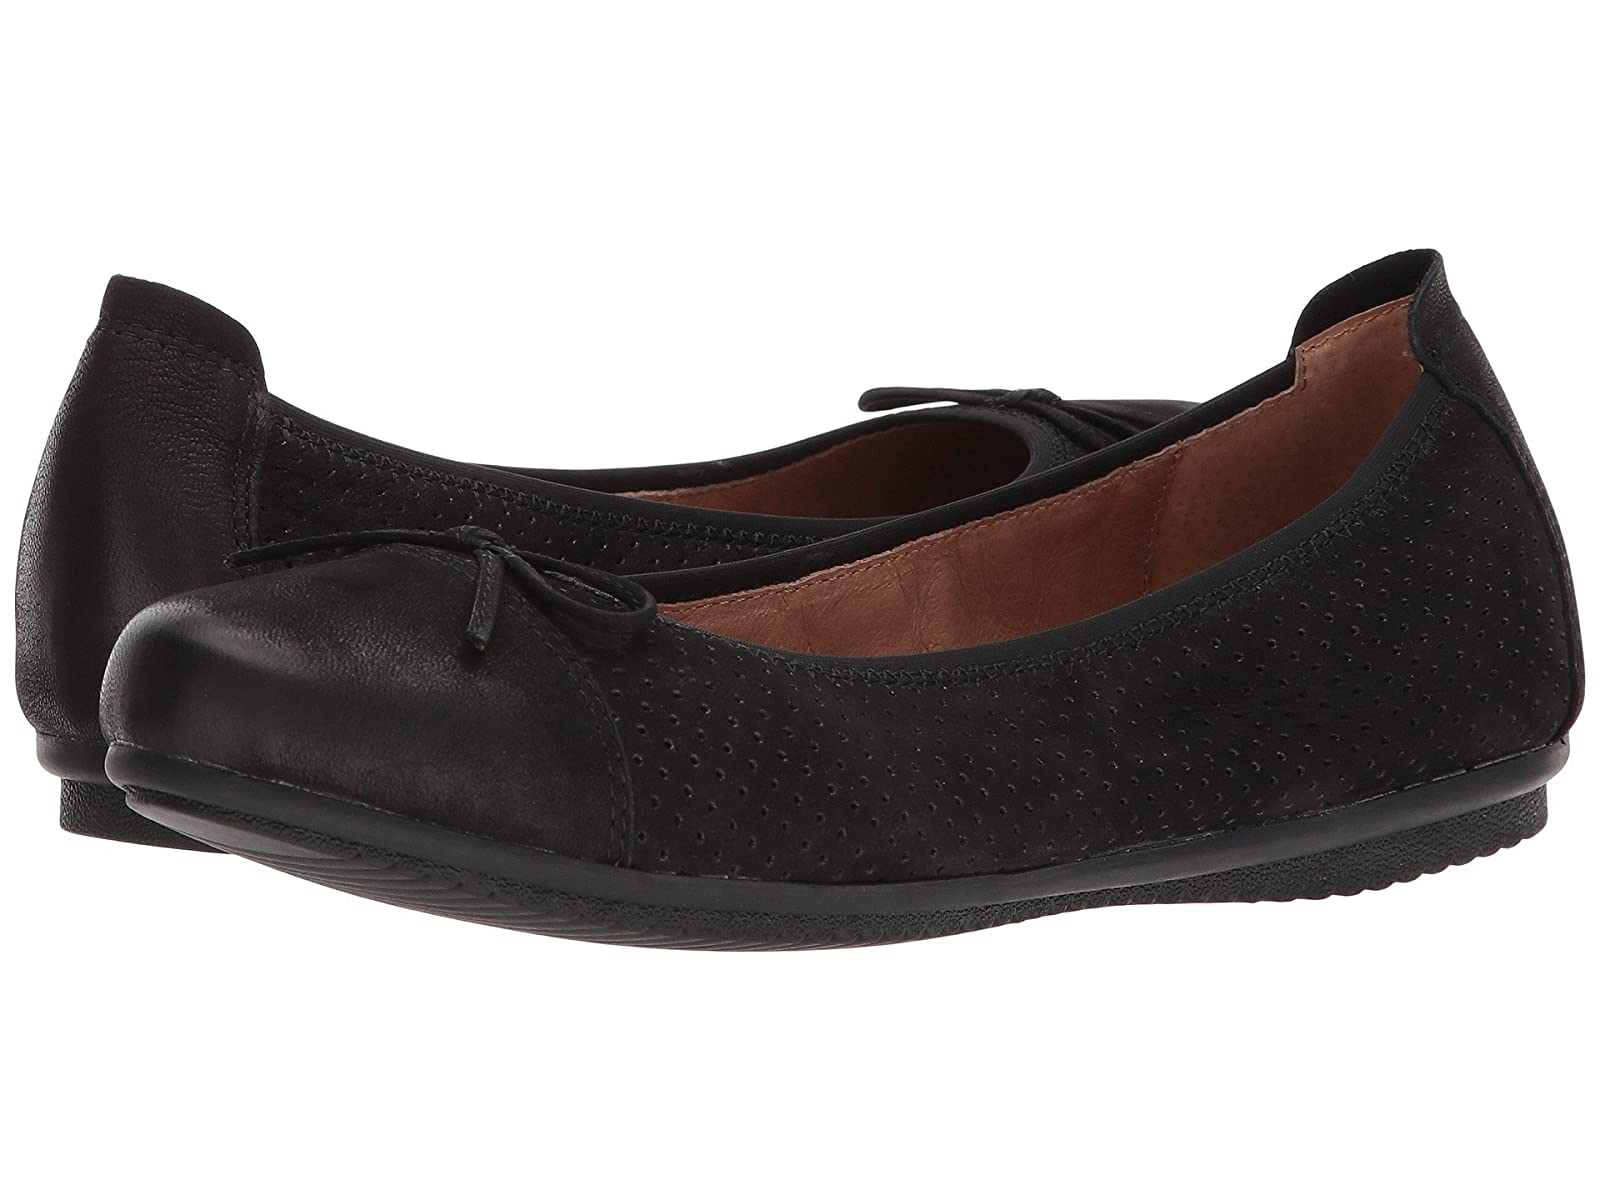 Josef Seibel Pippa 53Atmospheric grades have affordable shoes